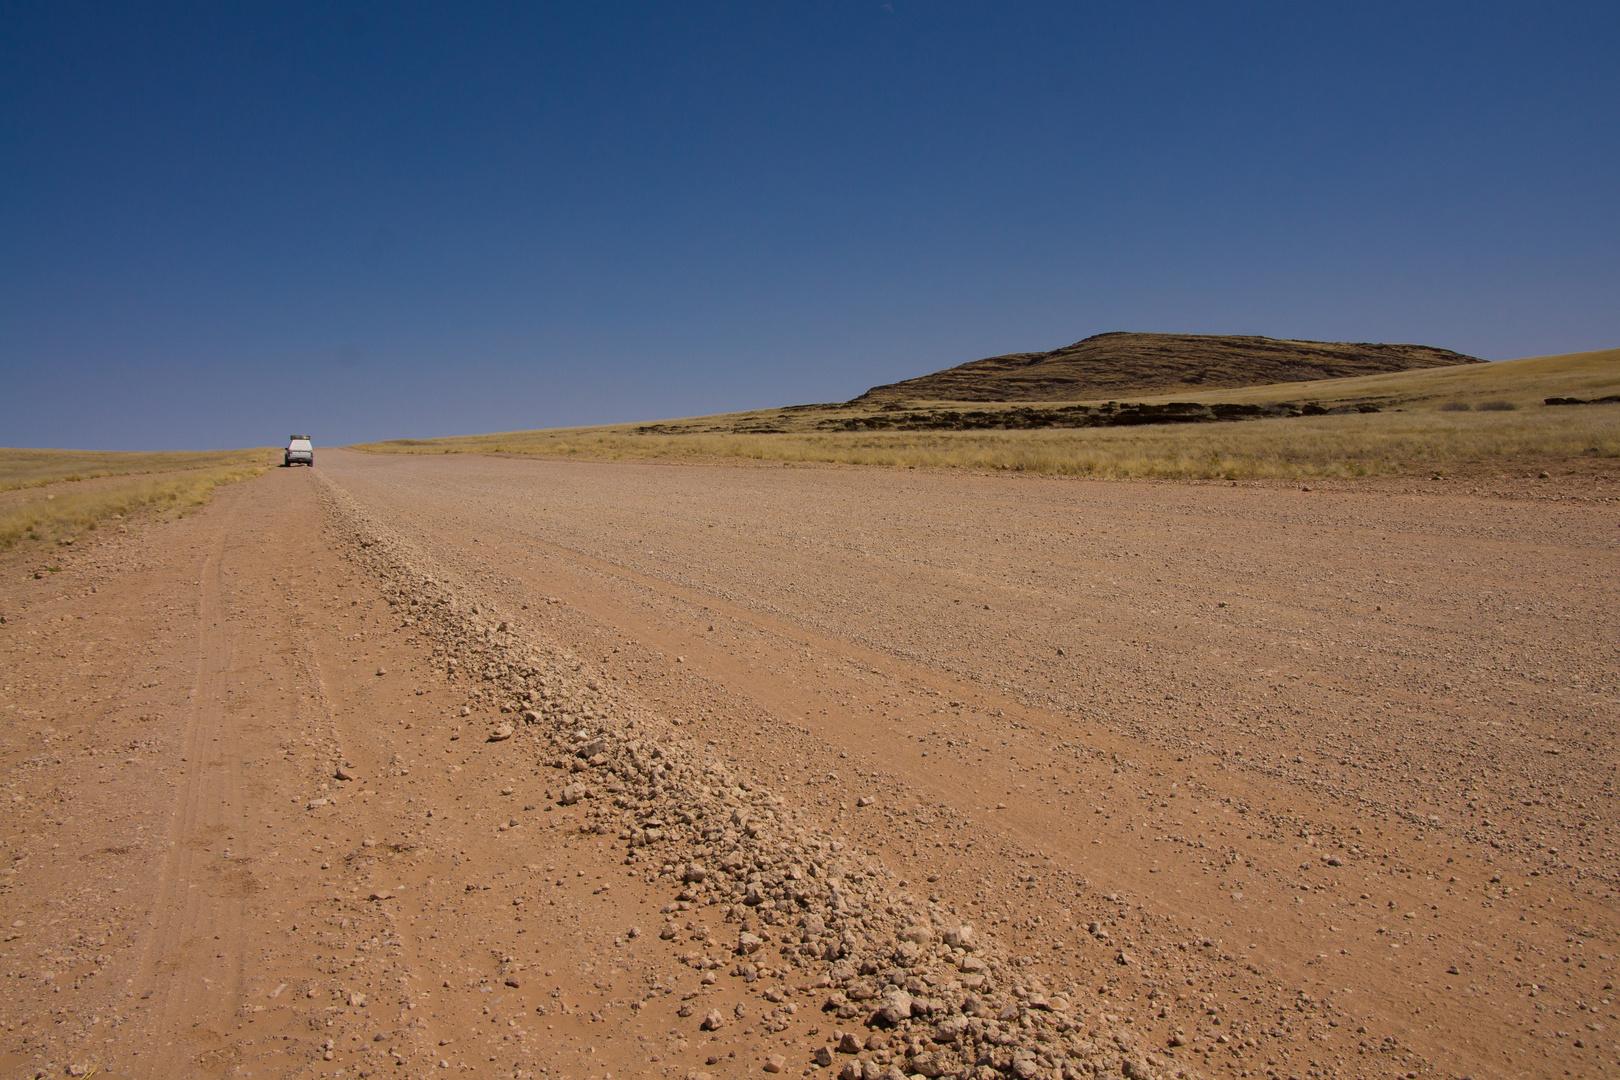 Autobahn in Namibia